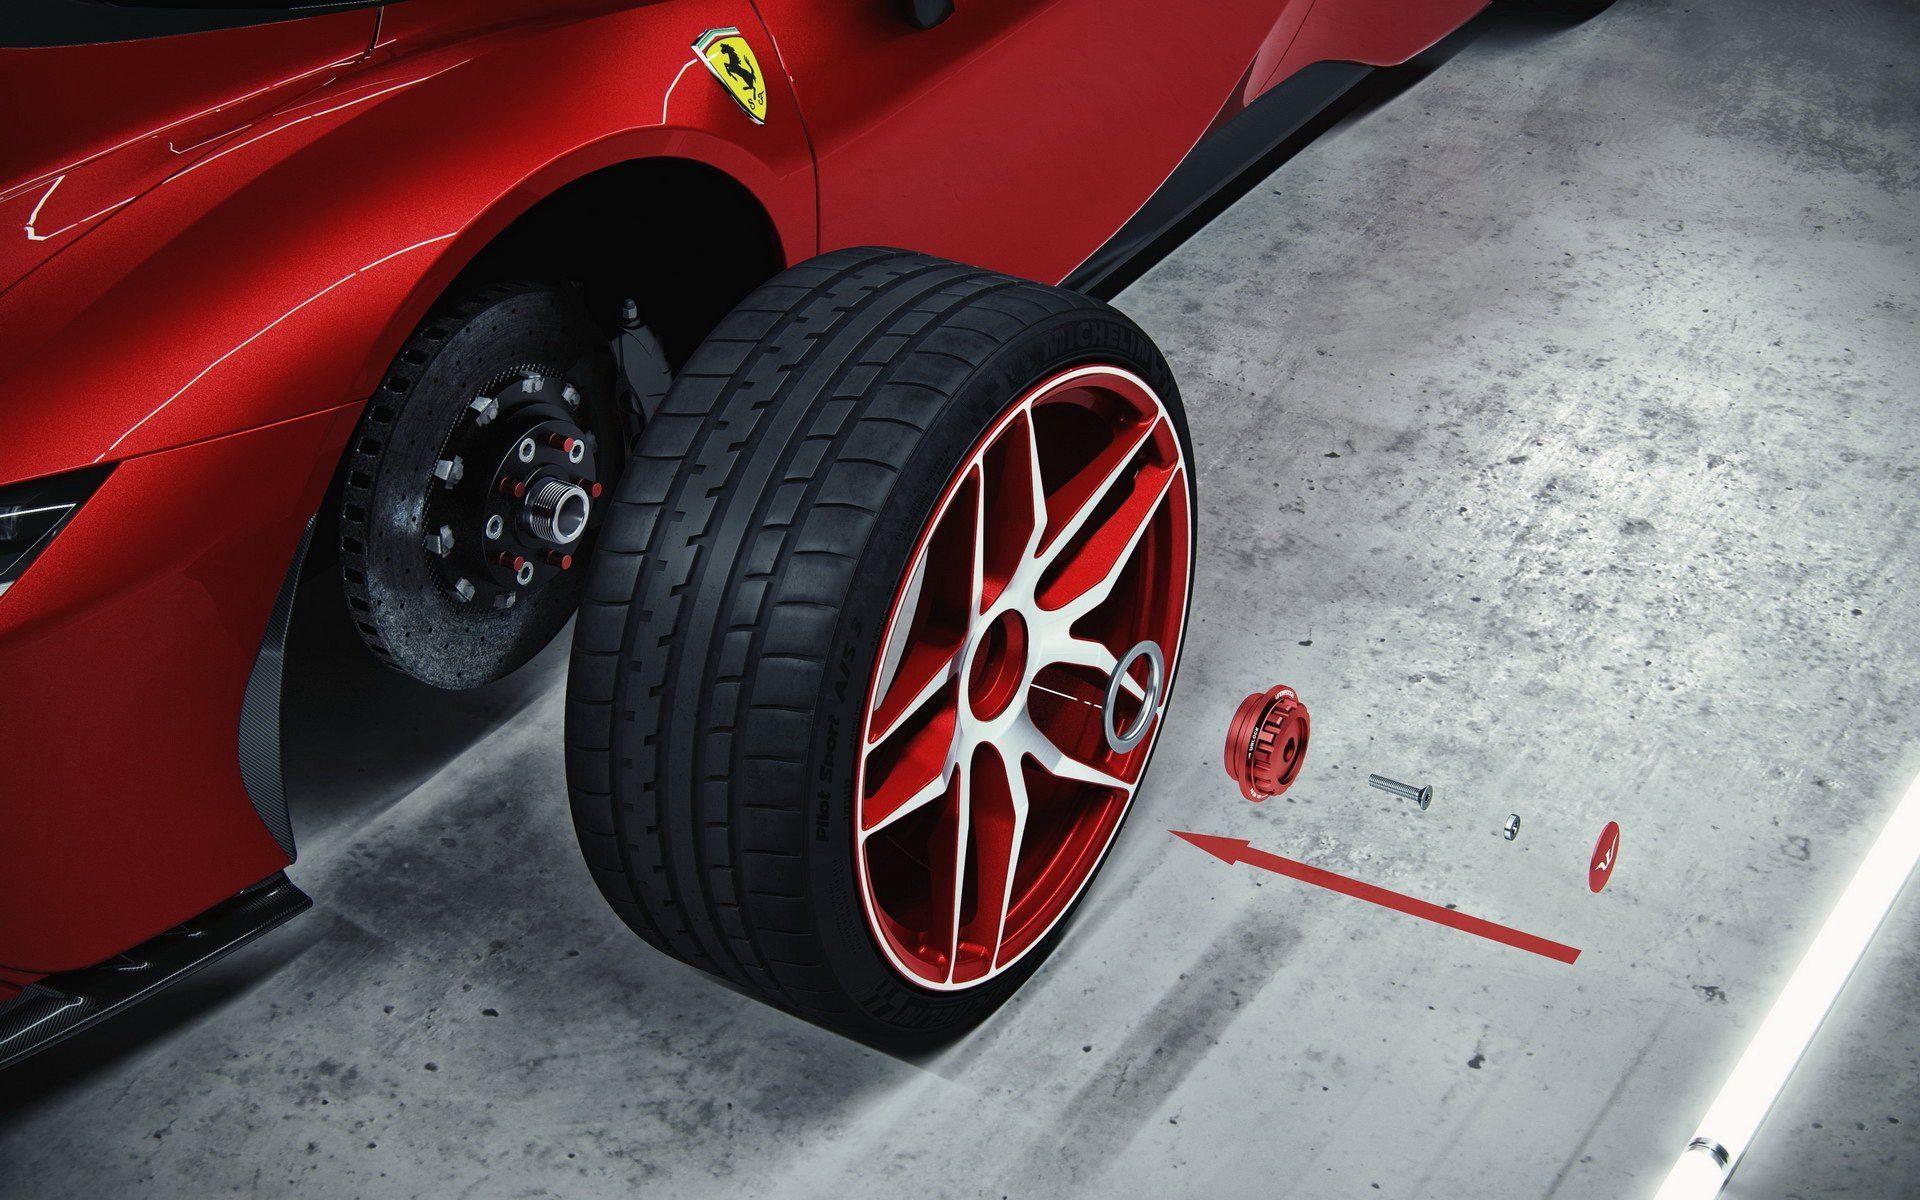 Ferrari_SF90_Stradale_by_Wheelsandmore_0000